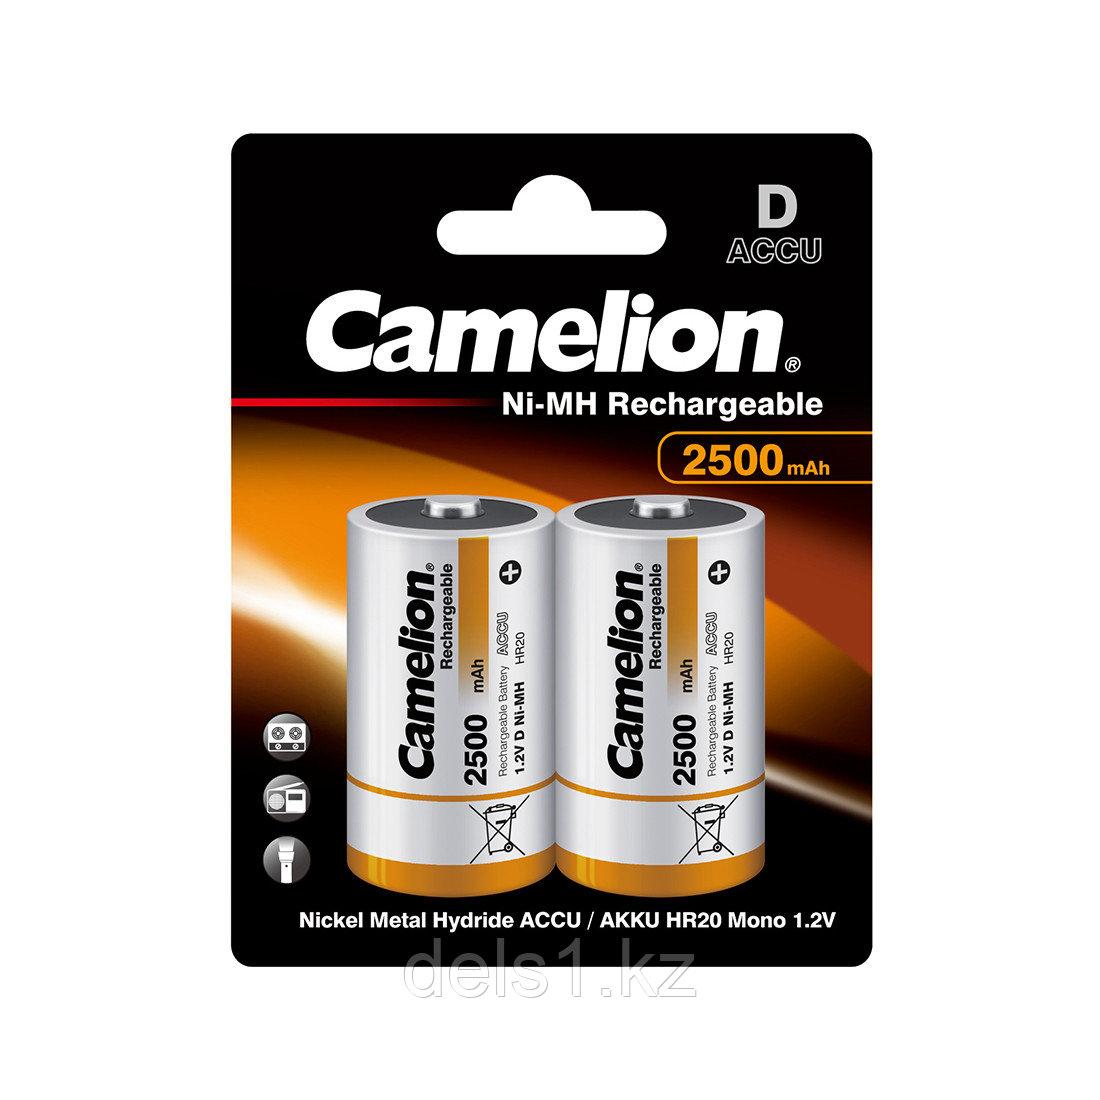 Аккумулятор, CAMELION, NH-D2500BP2, Rechargeable, D, 1.2V, 2500 mAh, 2 шт., Блистер